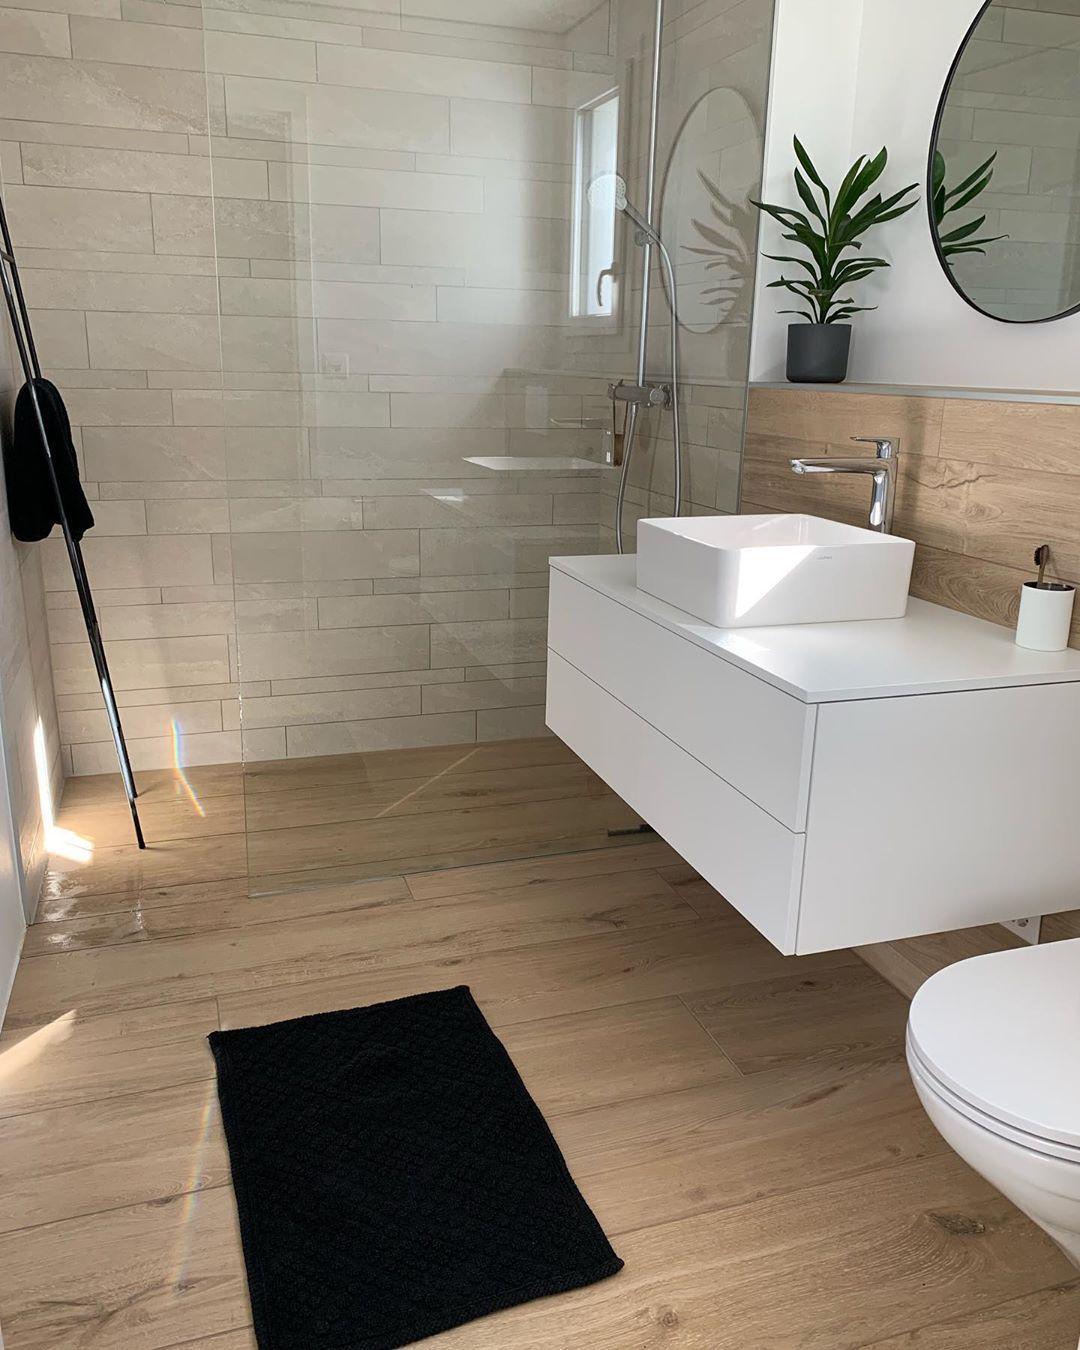 Bathroom Decorating Ideas Axor Citterio Minimalist Home Home